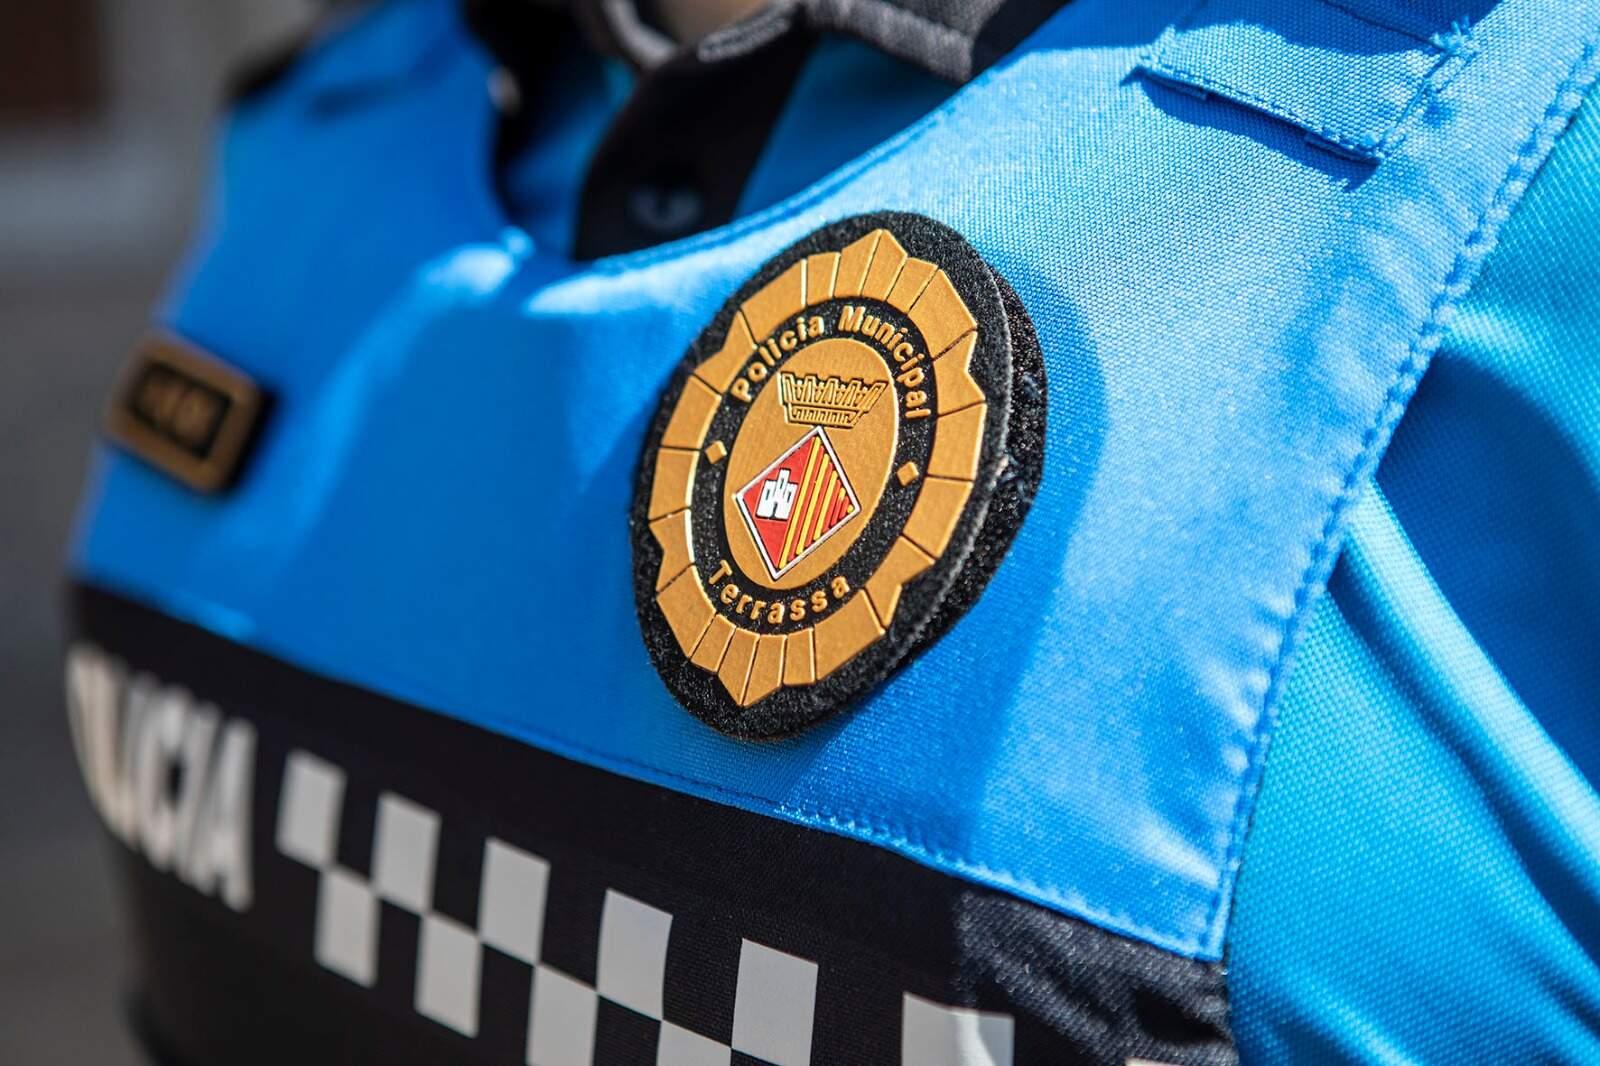 Agent de la Policia Municipal de Terrassa